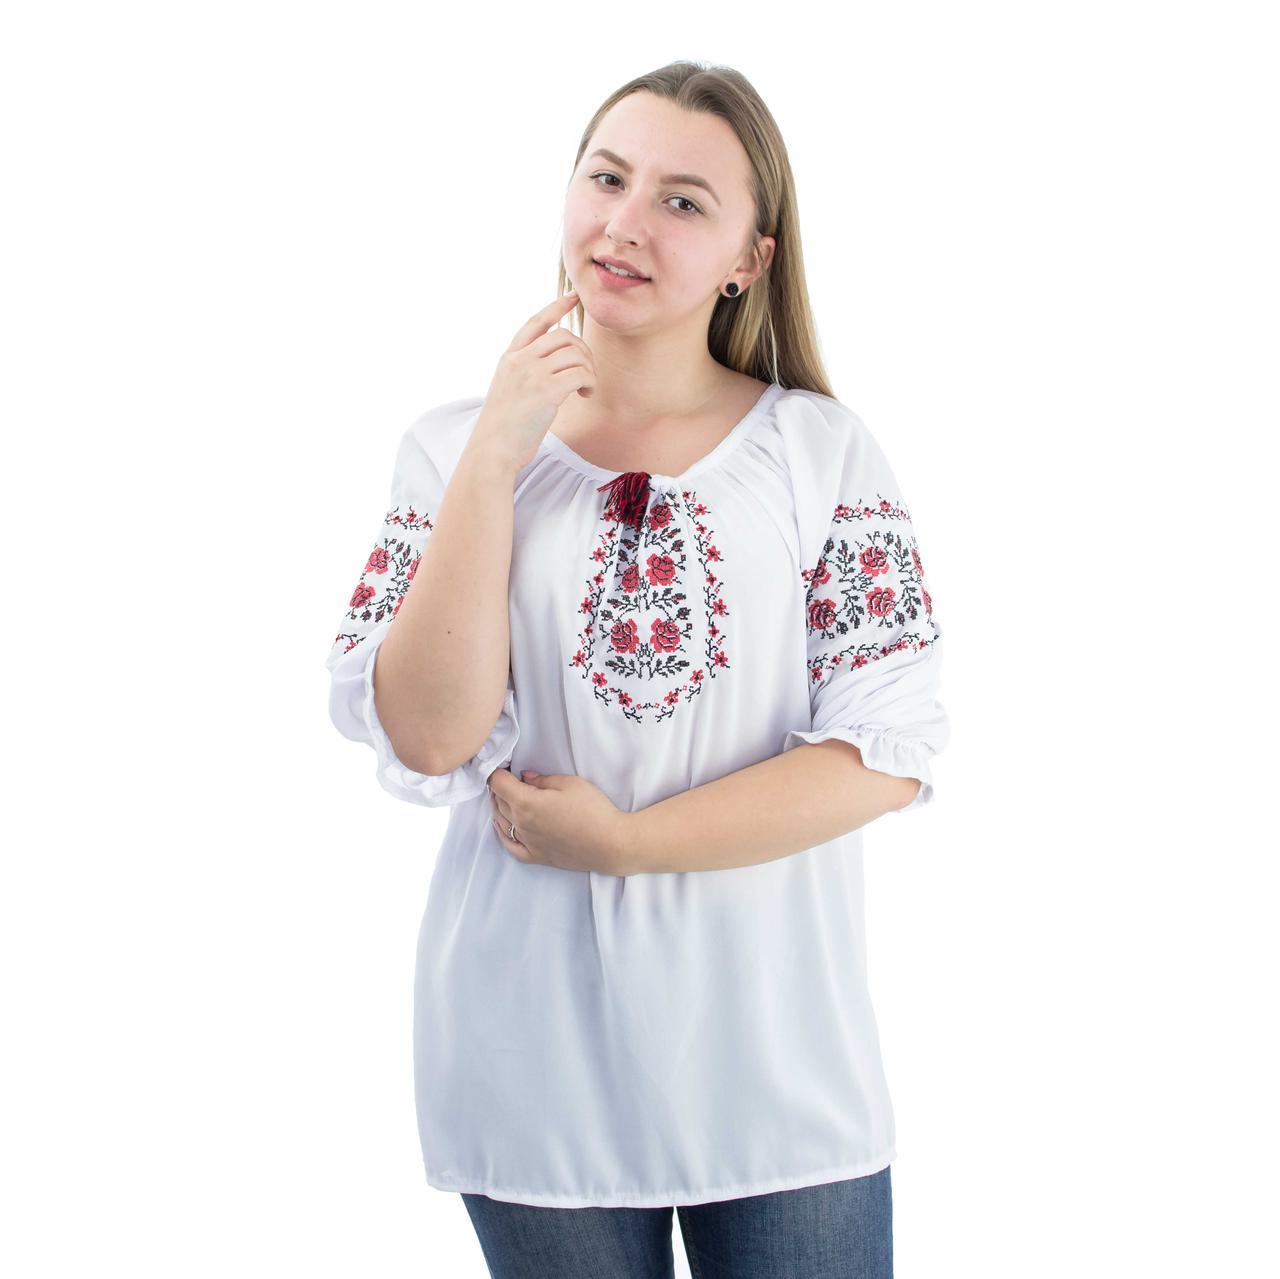 Вышиванки женские на шифоне